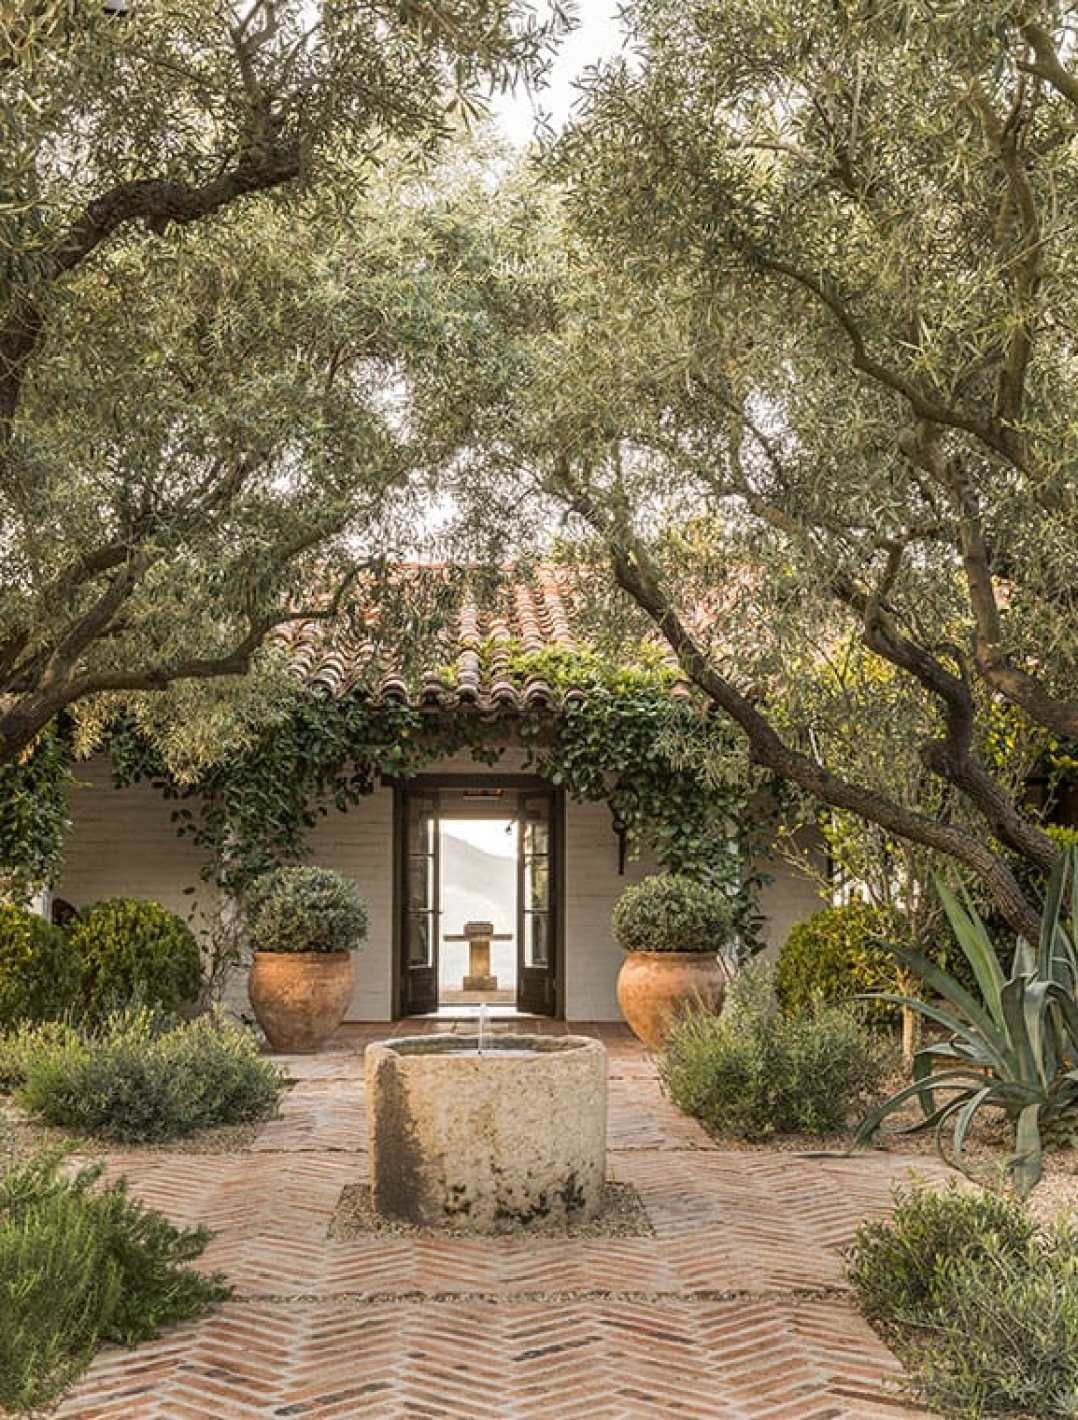 Design Ed-Scott Shrader Garden Design-rough luxe lifestyle #gardendesign #outdoor living